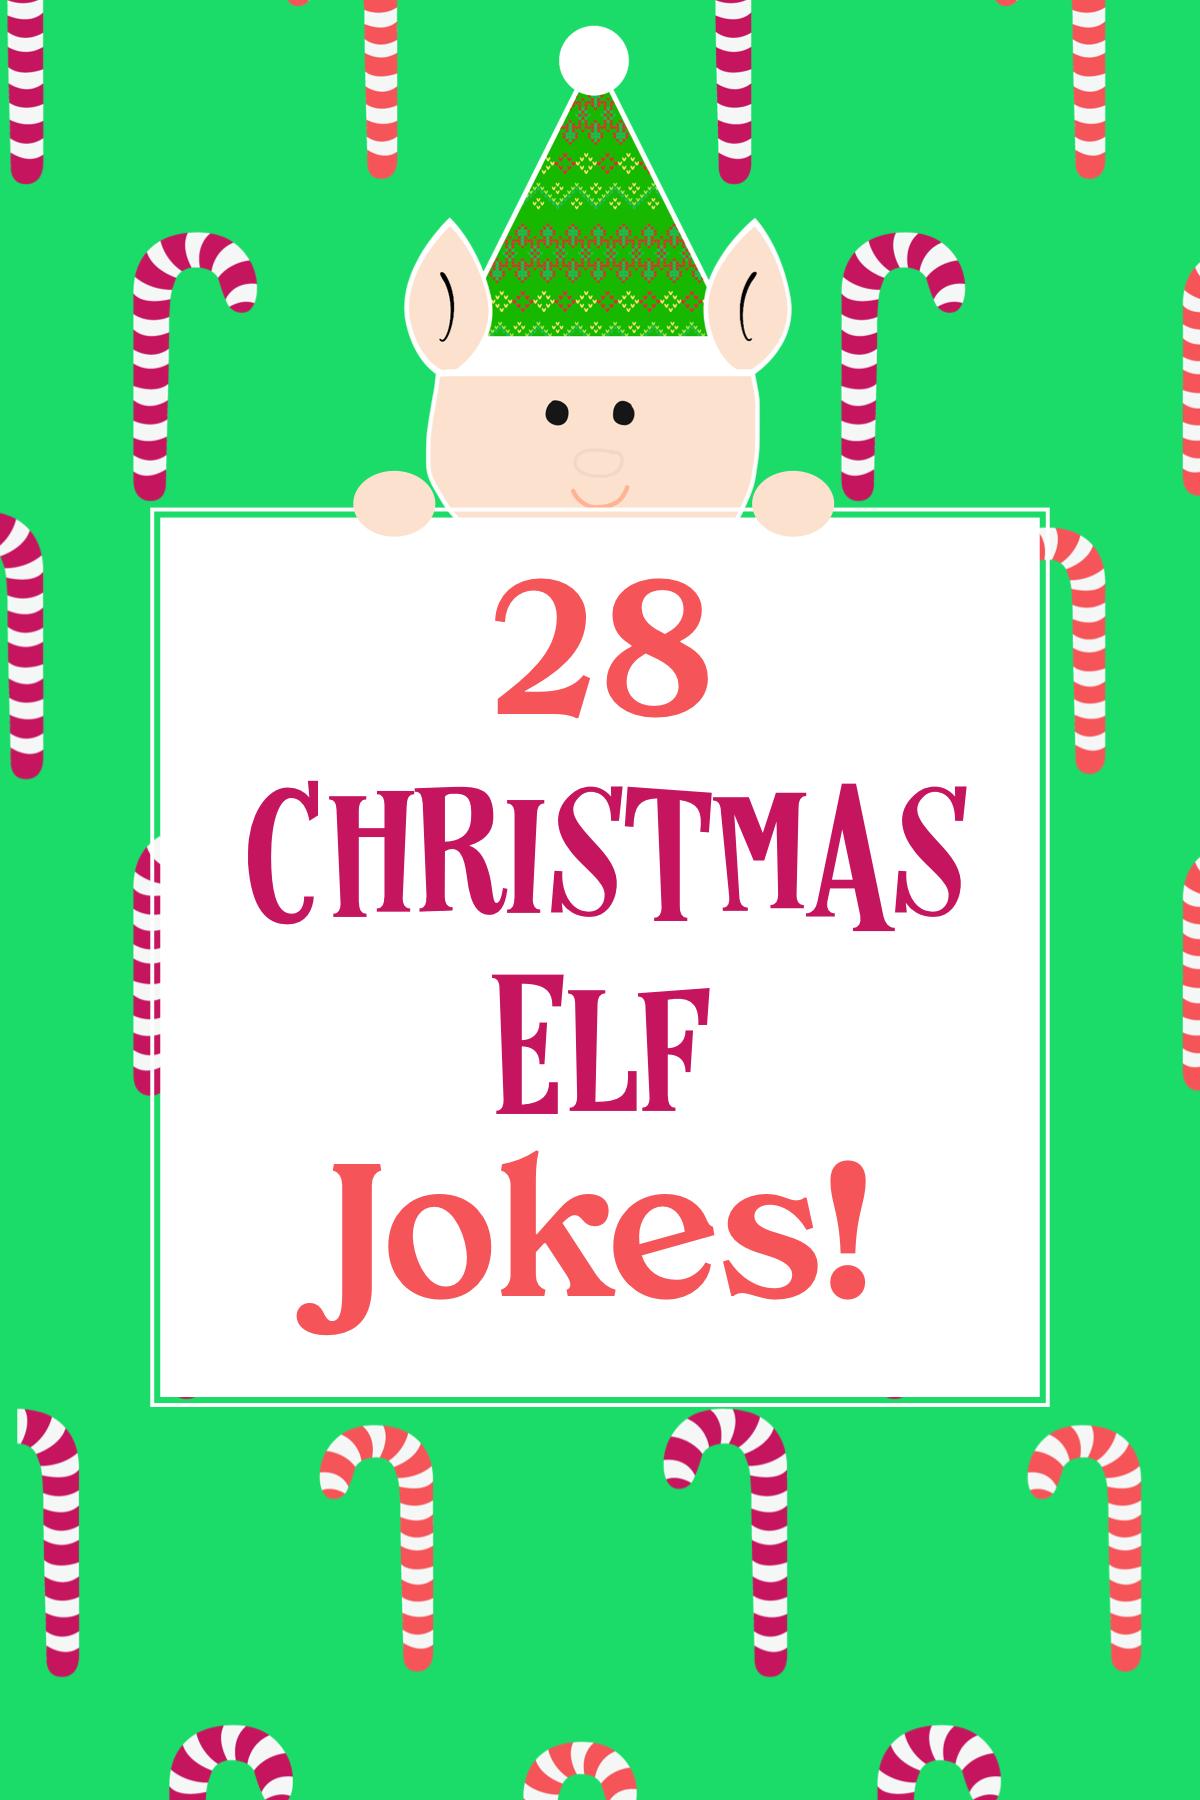 Christmas Elf Jokes Christmas jokes